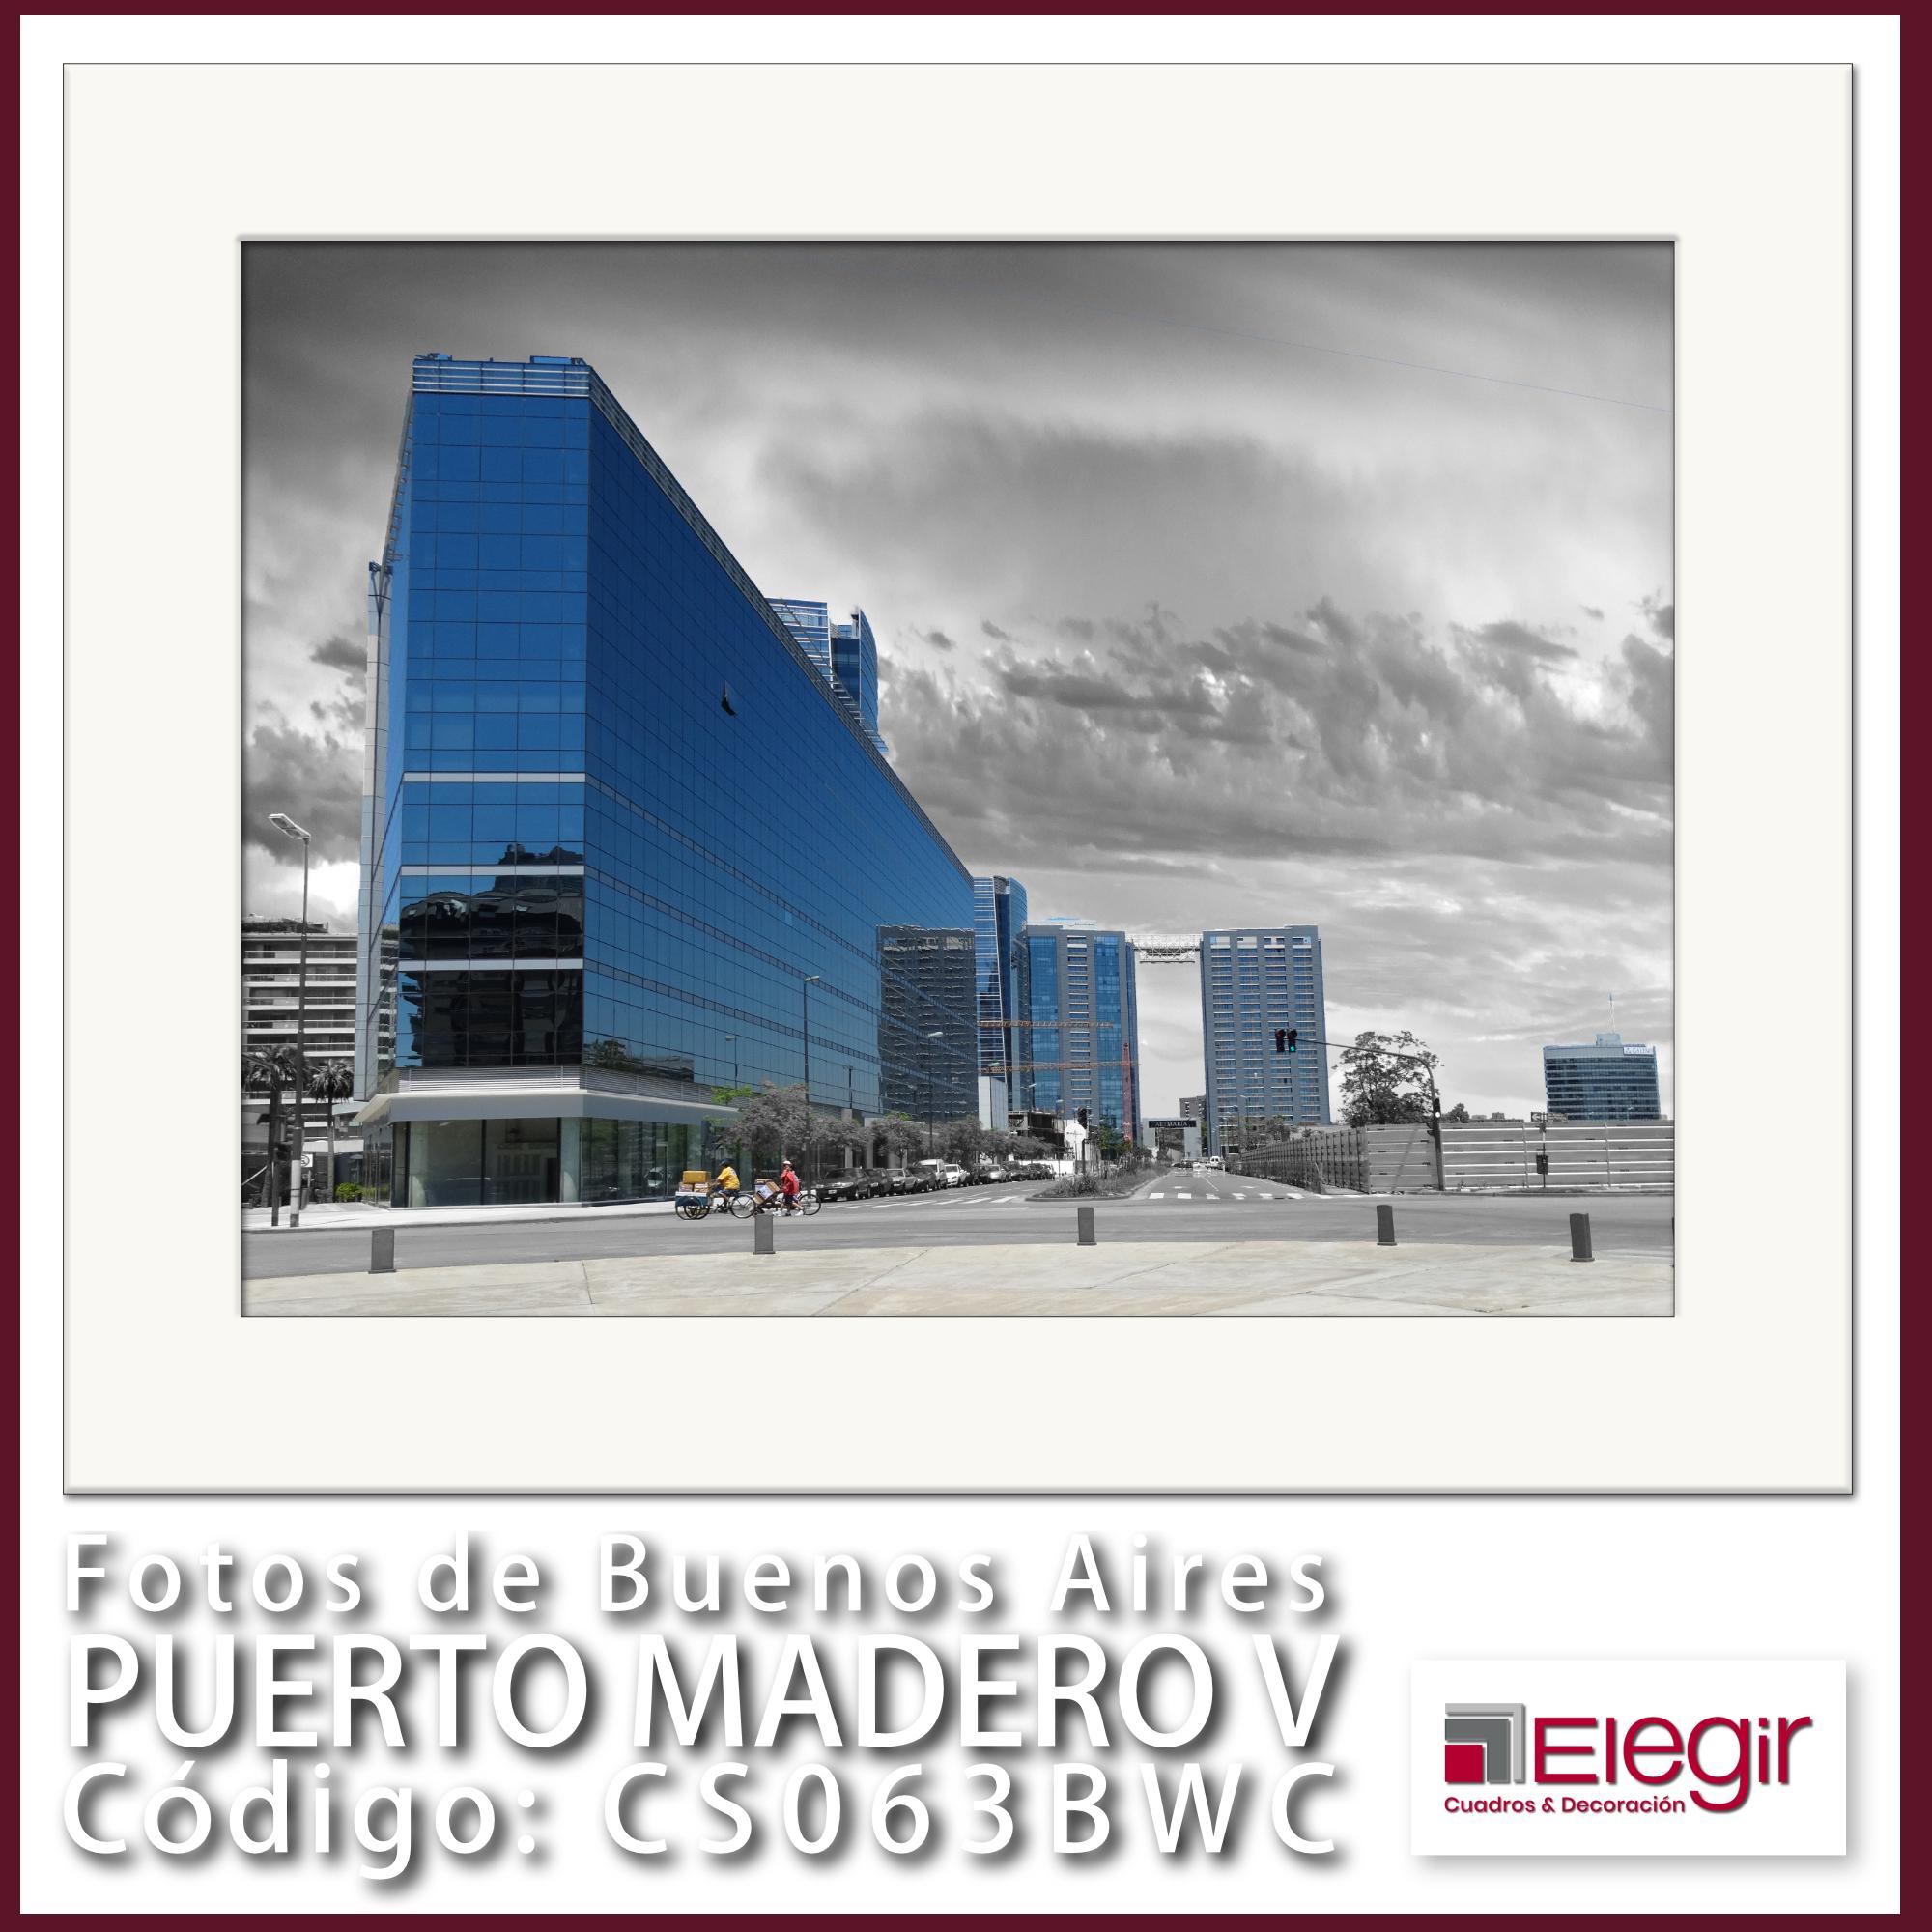 B CS063BWC Puerto Madero V 40x30